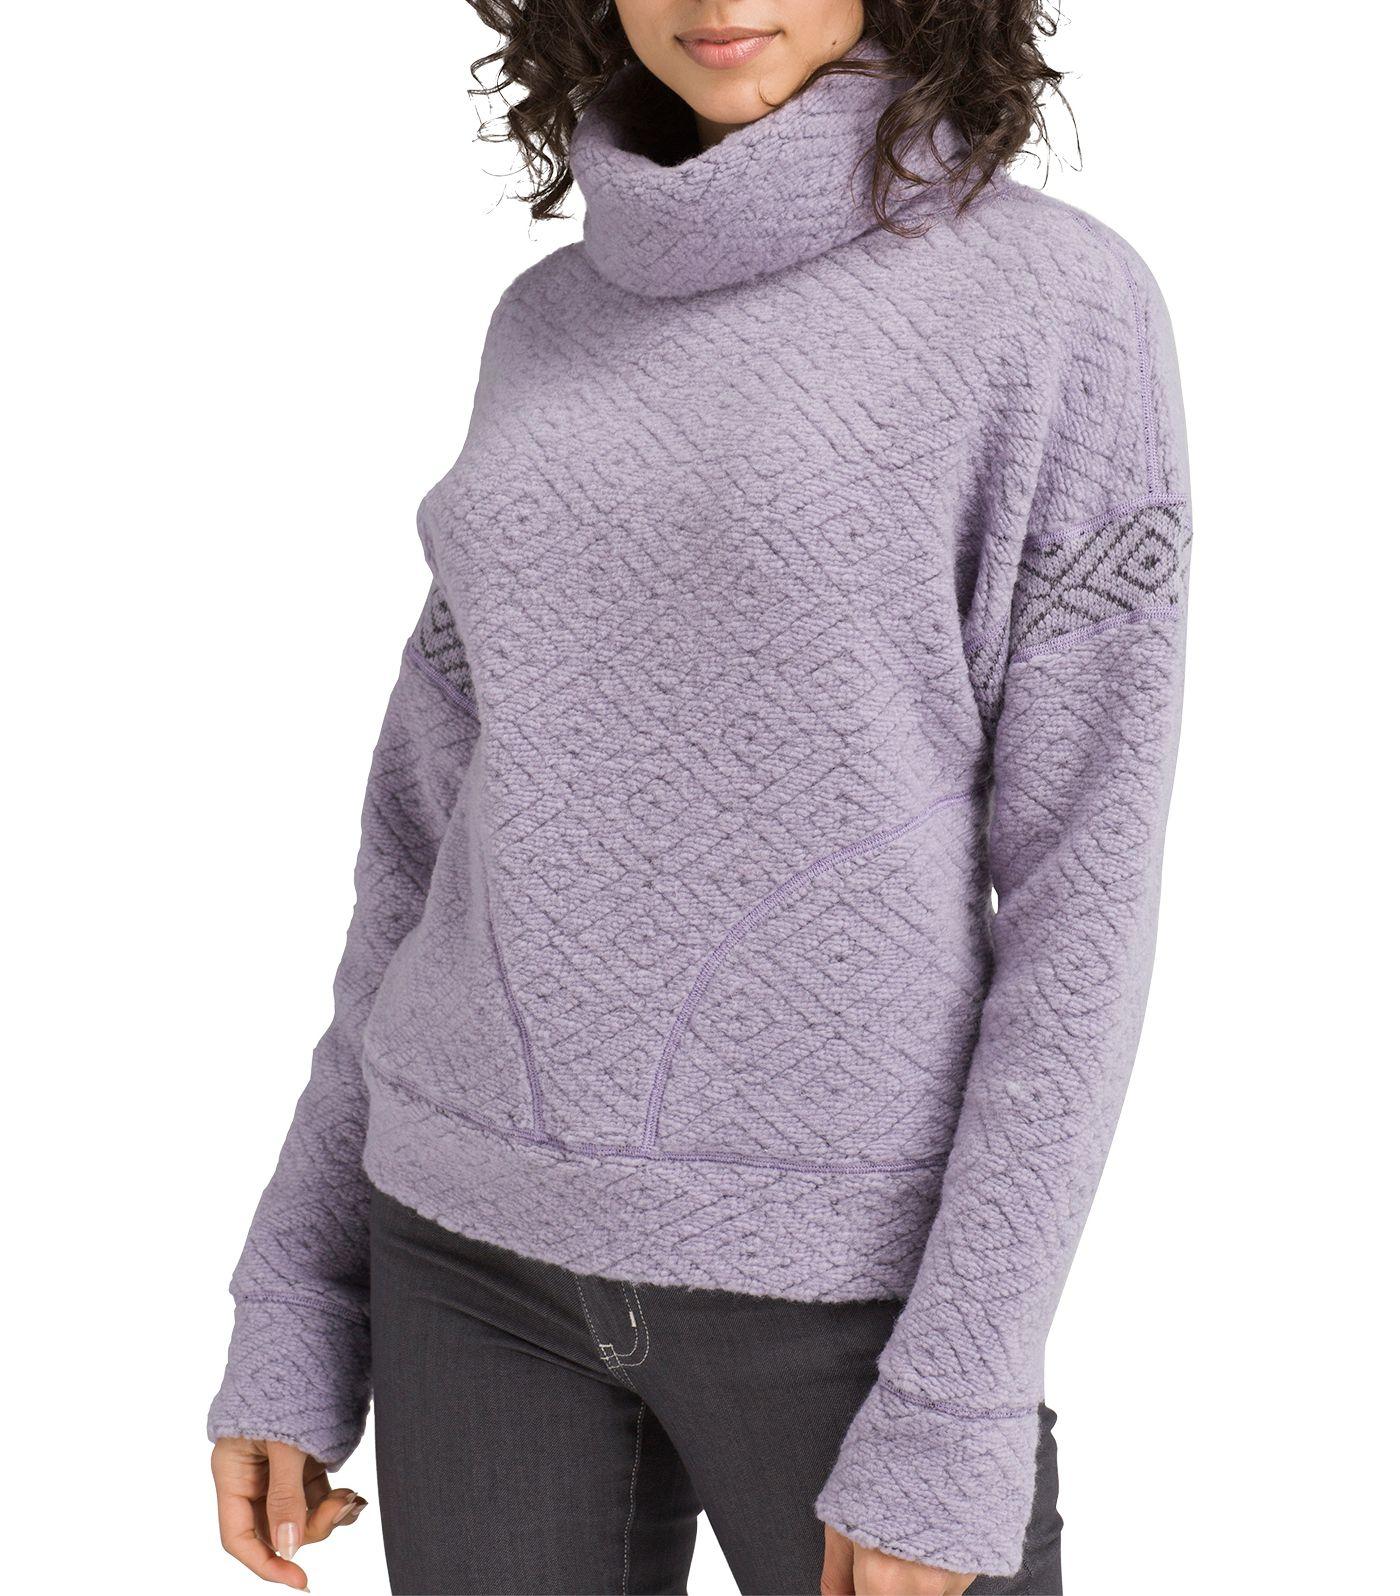 prAna Women's Crestland Pullover Sweater